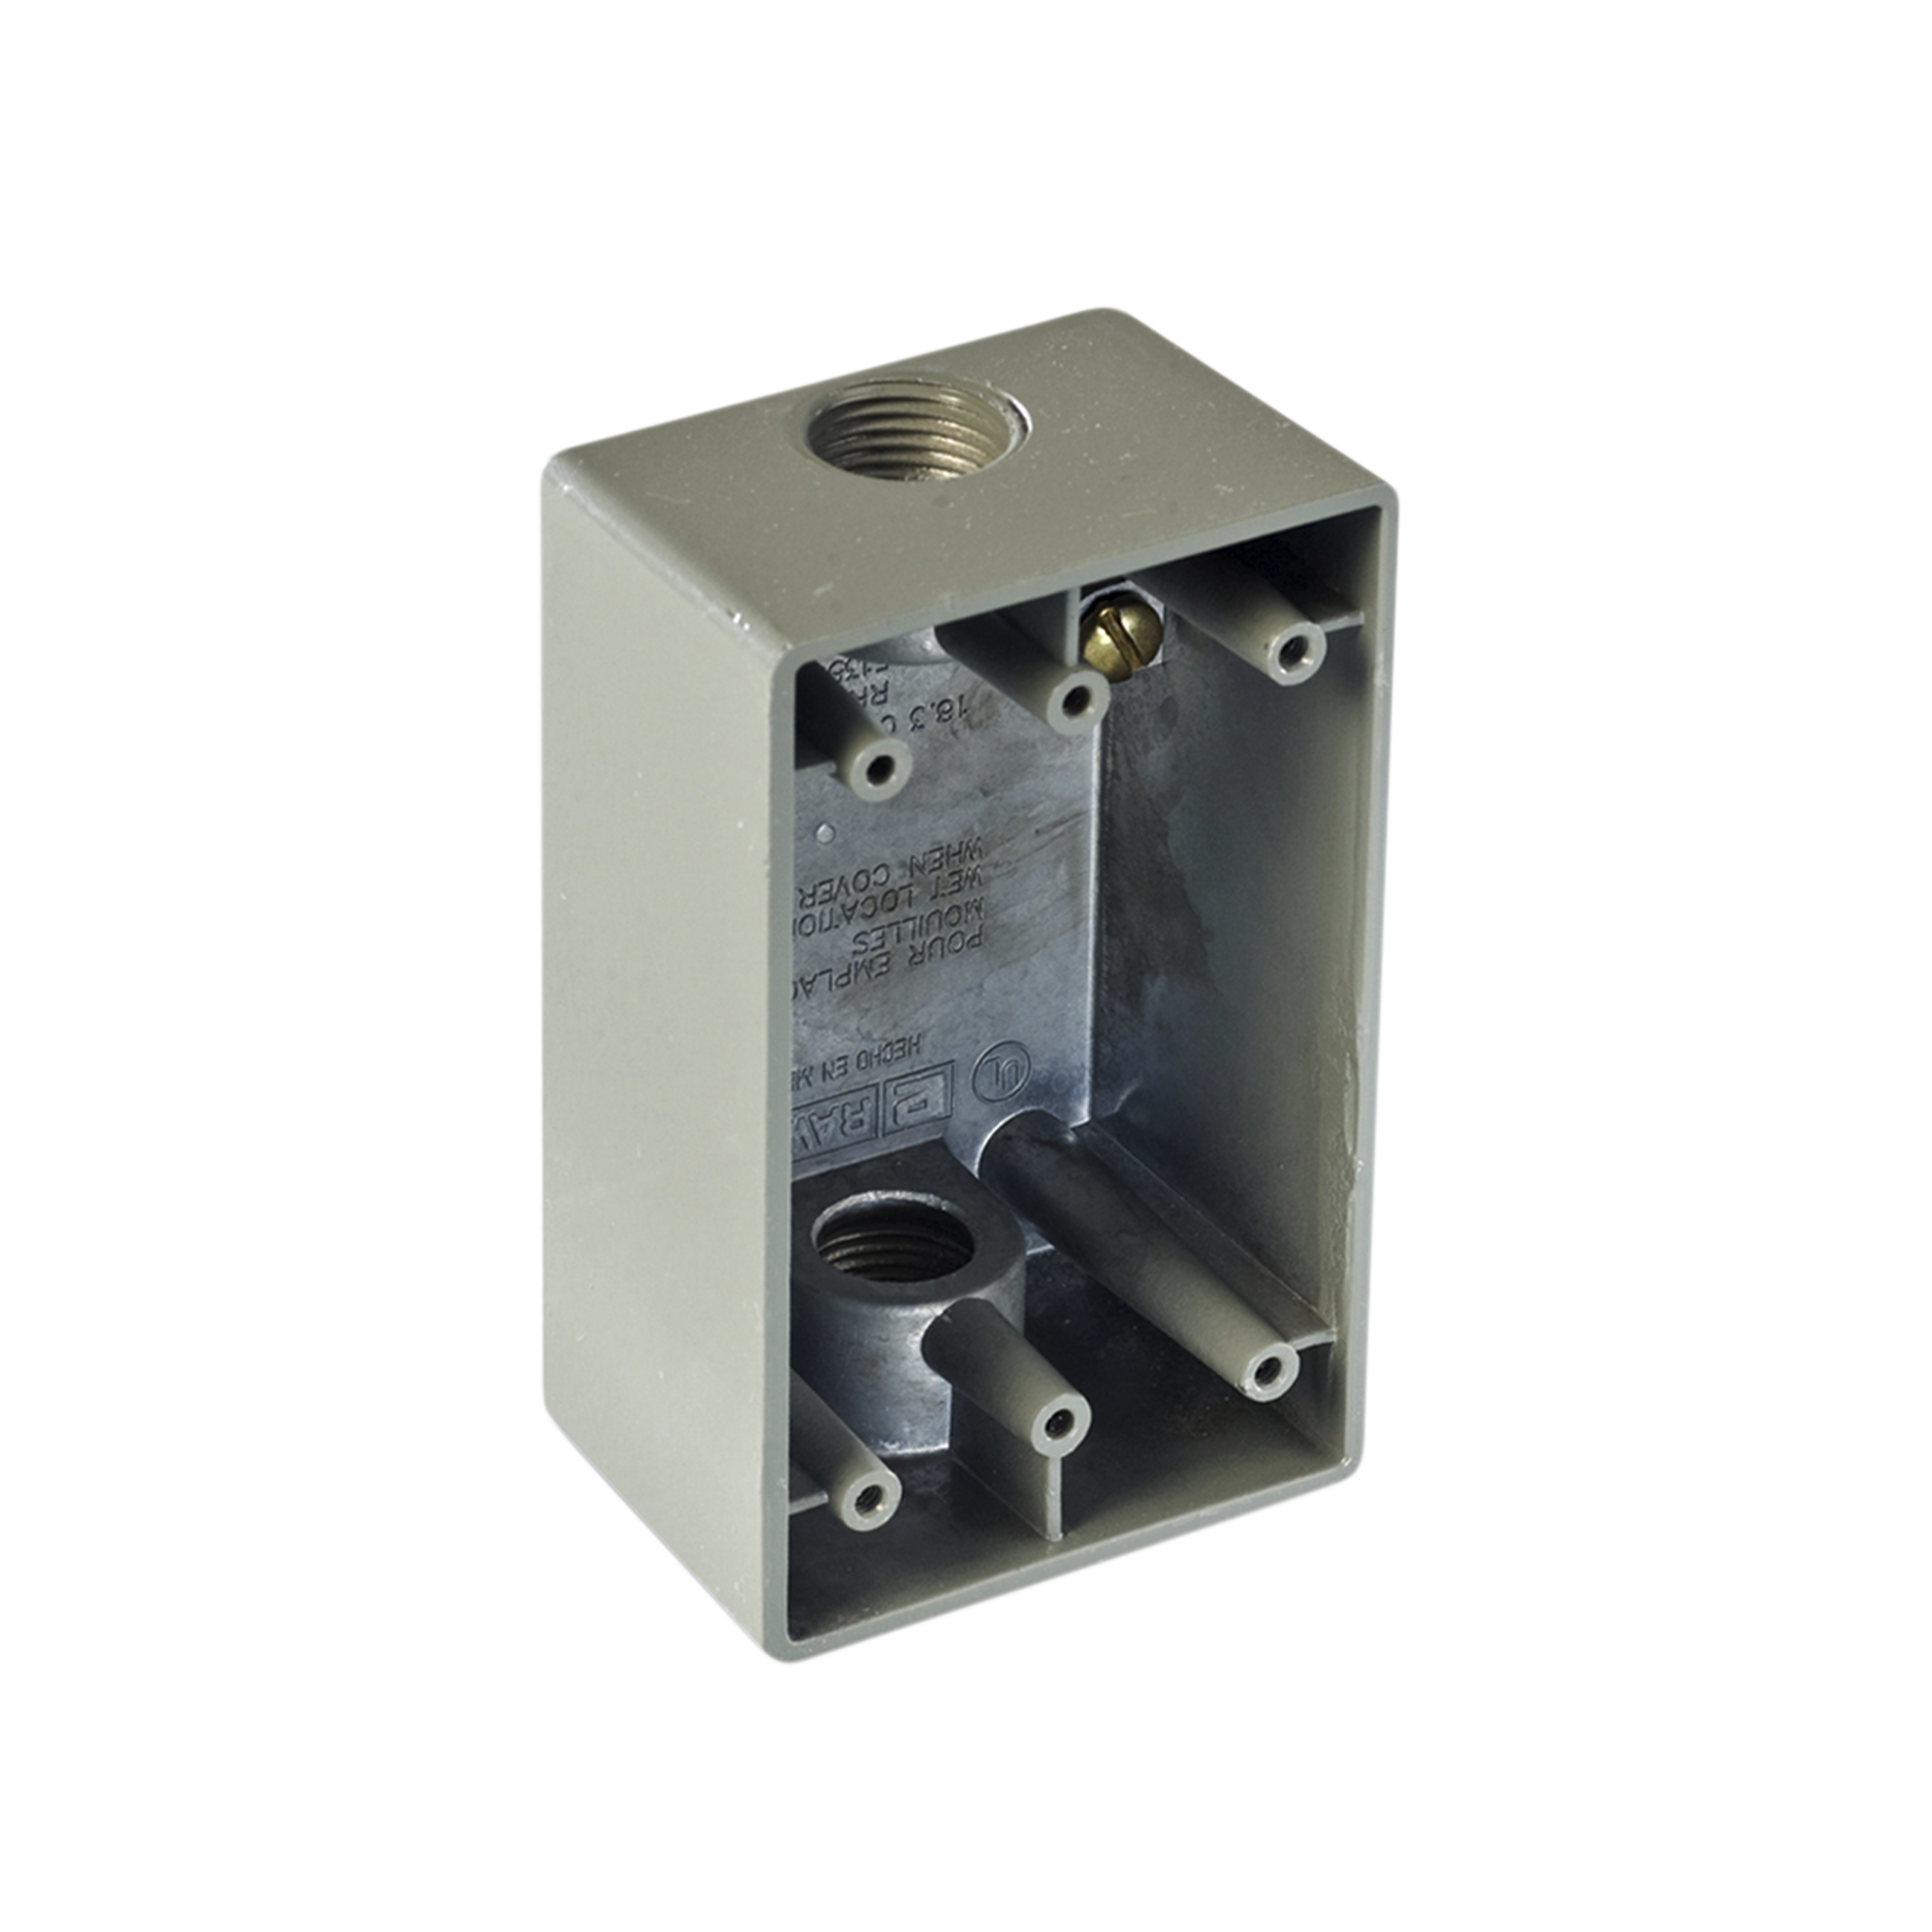 Caja Condulet FS de 1 ( 25.4 mm) con dos bocas a prueba de intemperie.